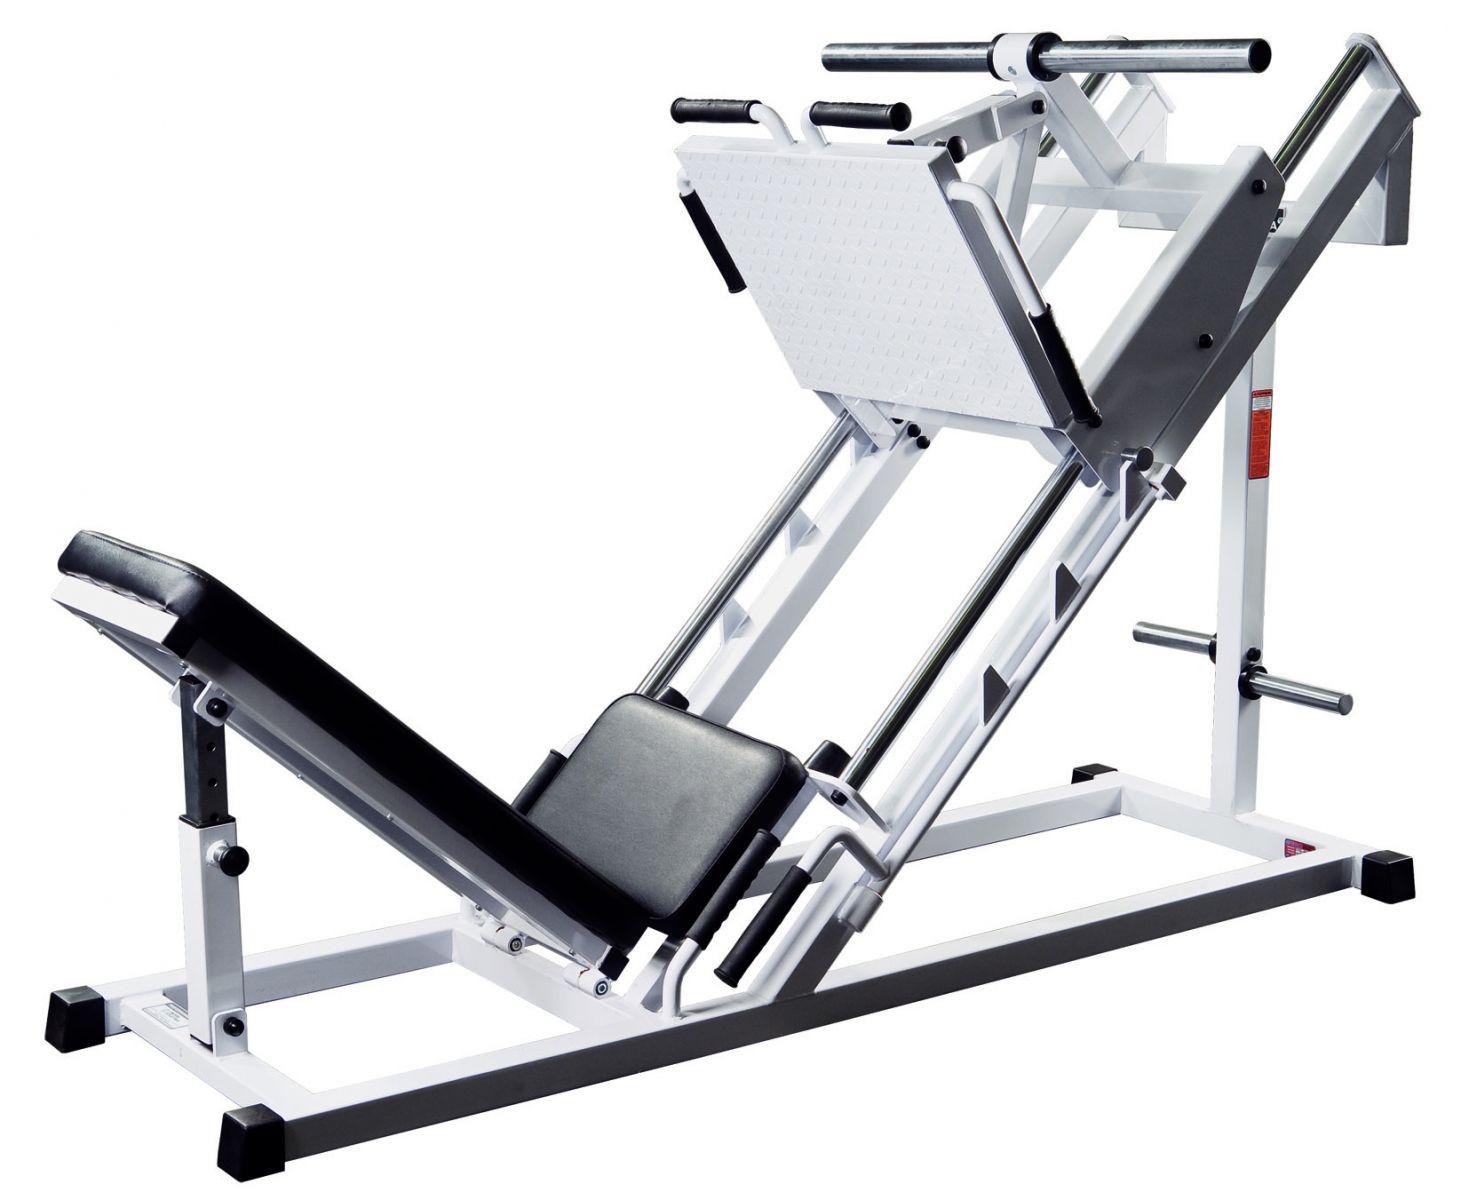 équipements de fitness